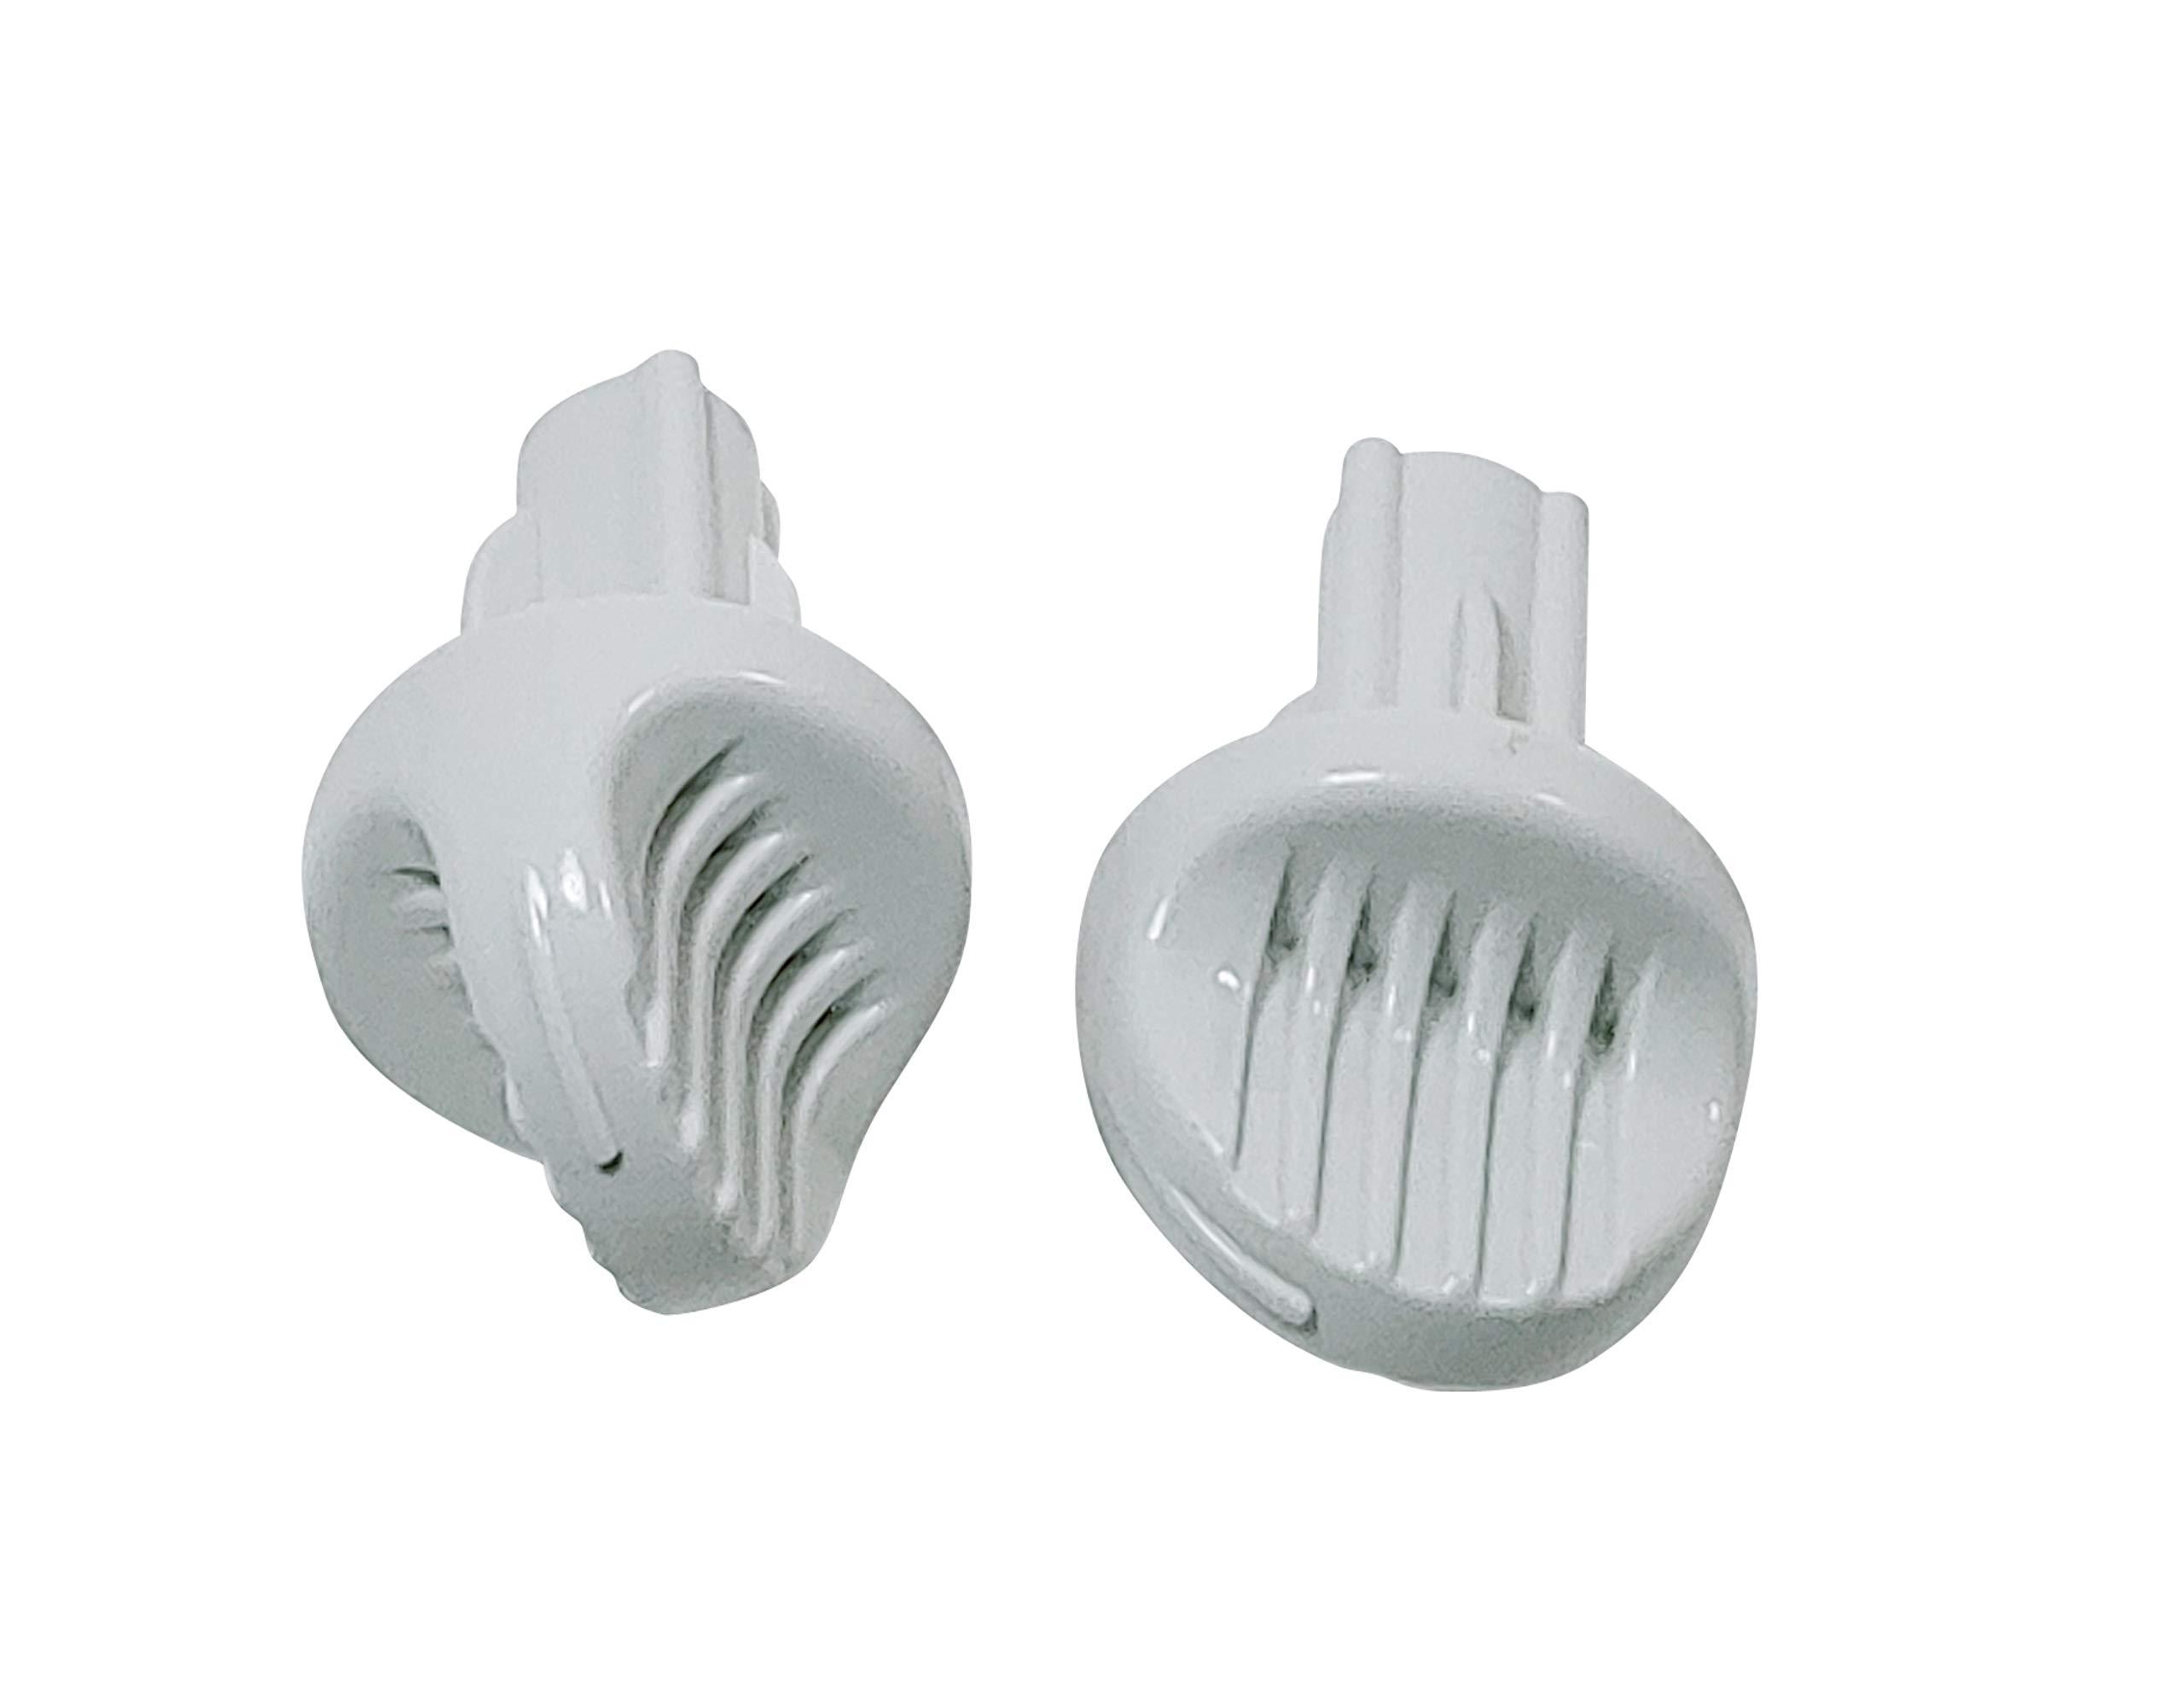 Just4Repair Air Conditioner Control Knob with Spring Metal Insert 201121190001 (2) by Just4Repair